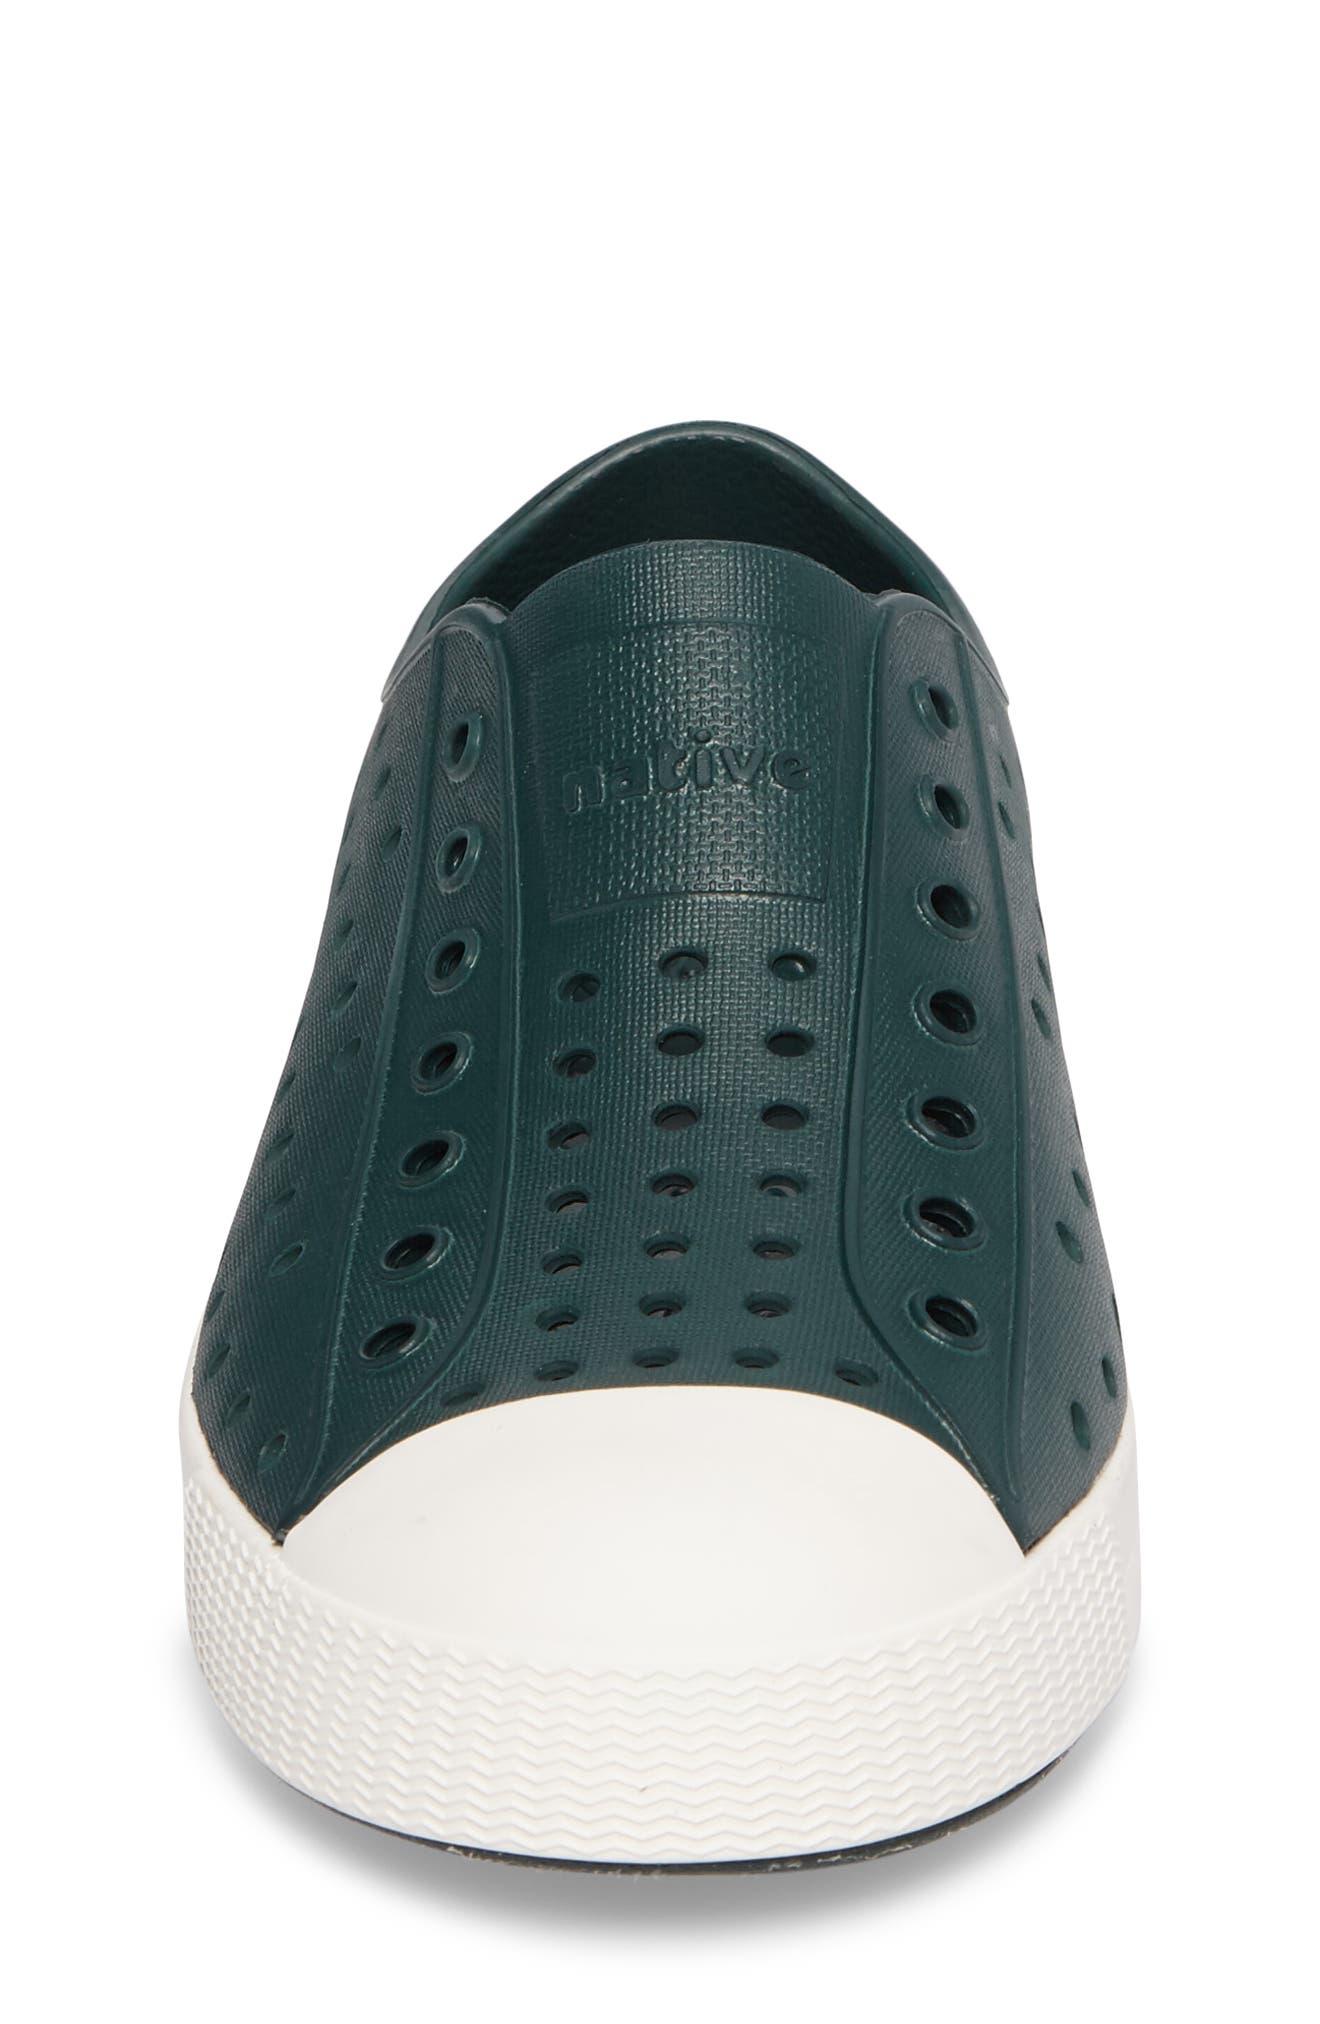 'Jefferson' Water Friendly Slip-On Sneaker,                             Alternate thumbnail 193, color,